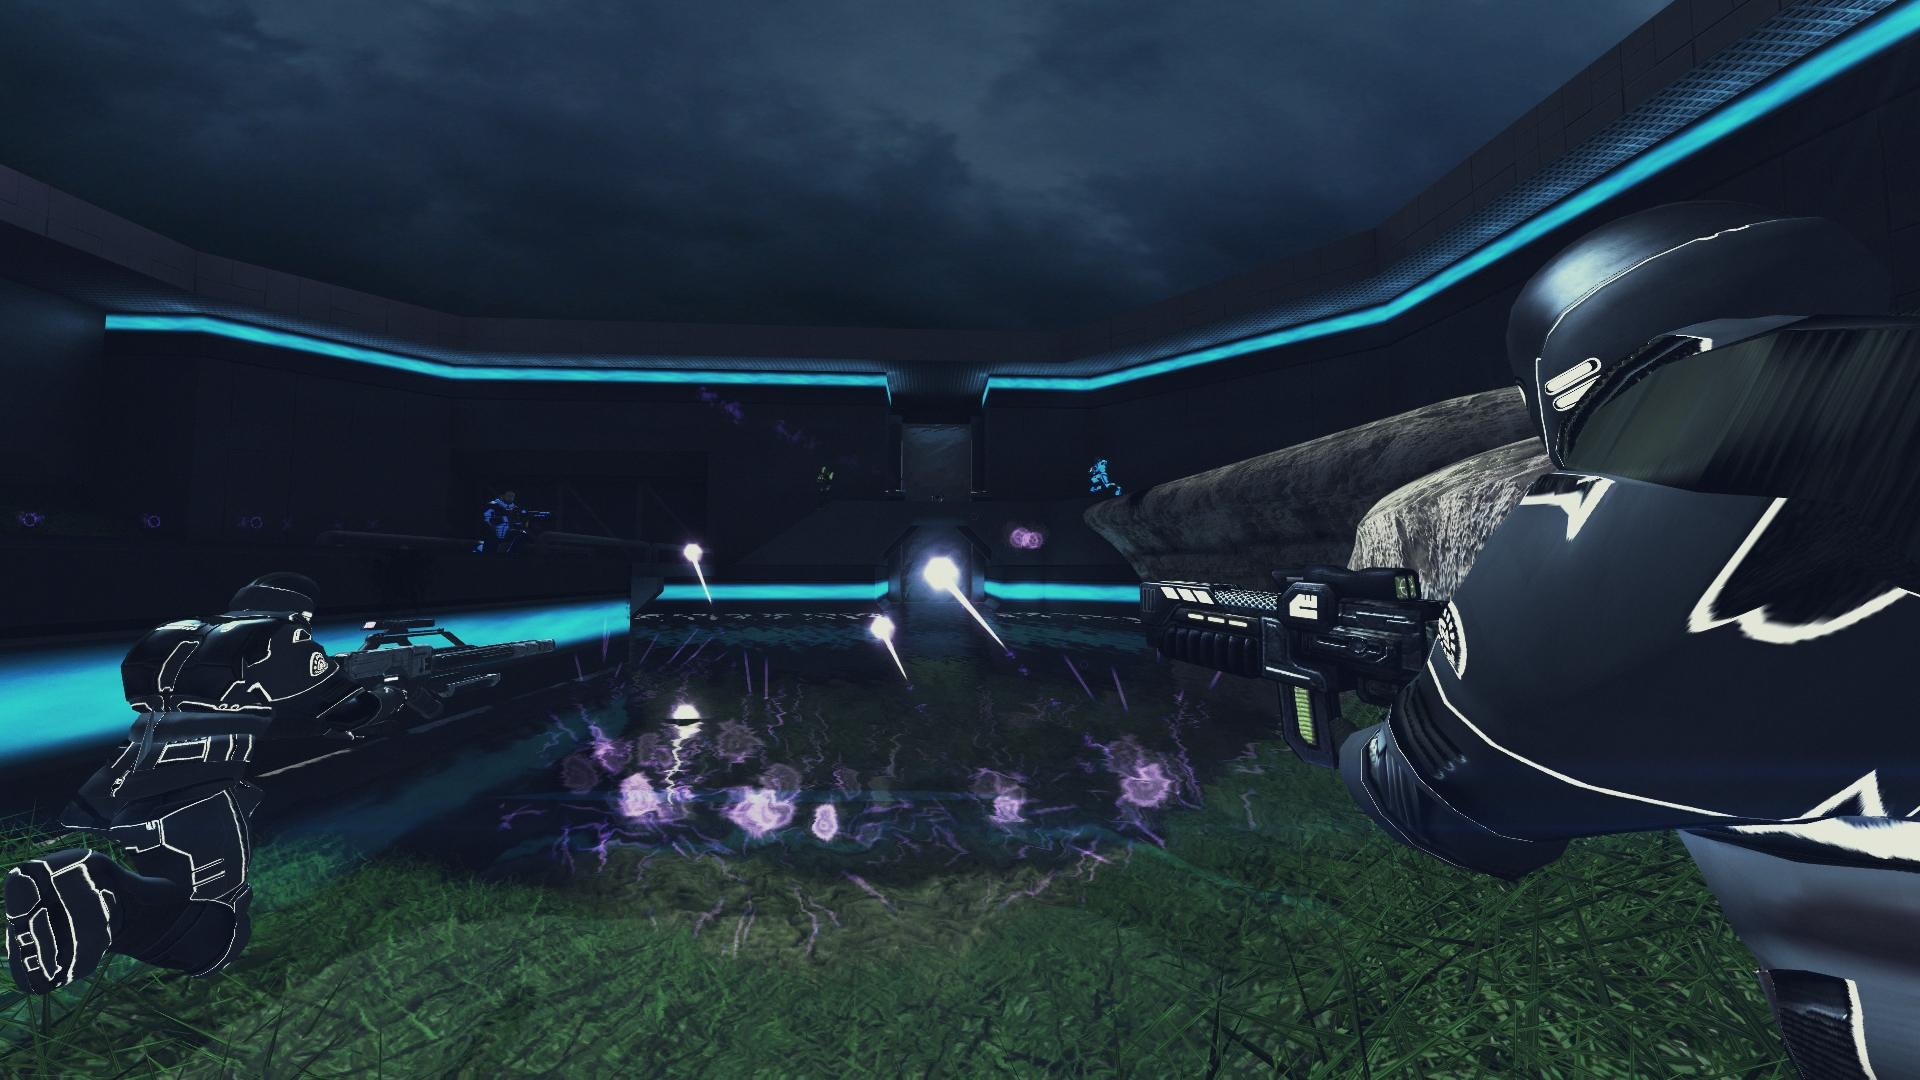 Xonotic arena